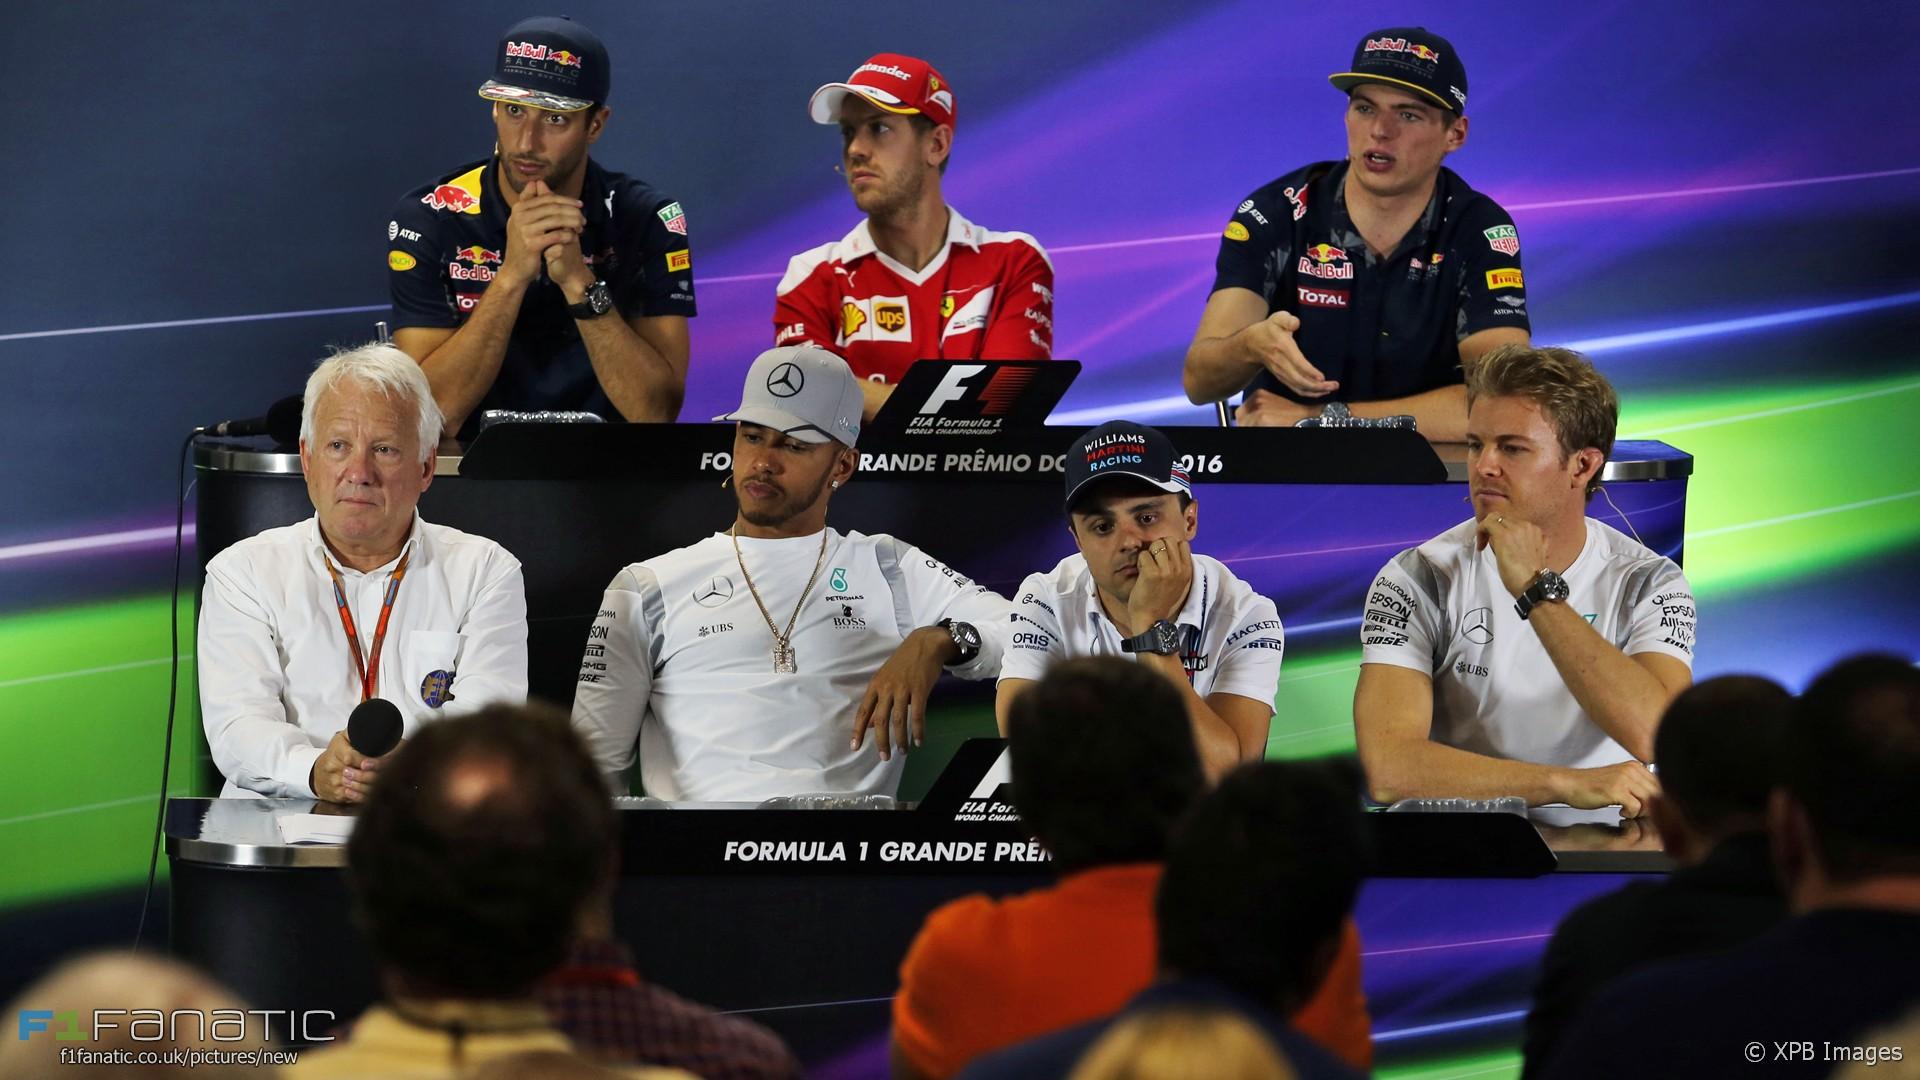 Daniel Ricciardo, Sebastian Vettel, Max Verstappen, Charlie Whiting, Lewis Hamilton, Felipe Massa, Nico Rosberg, Autodromo Hermanos Rodriguez, 2016